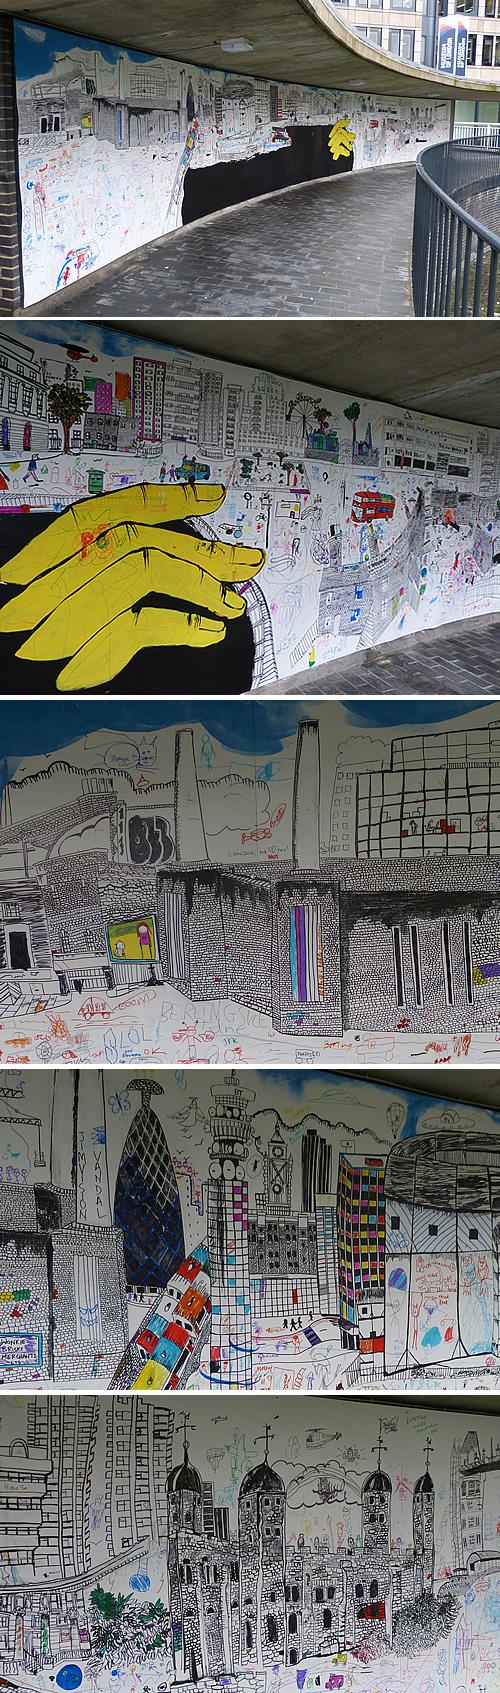 johndolan-museumoflondon.jpg